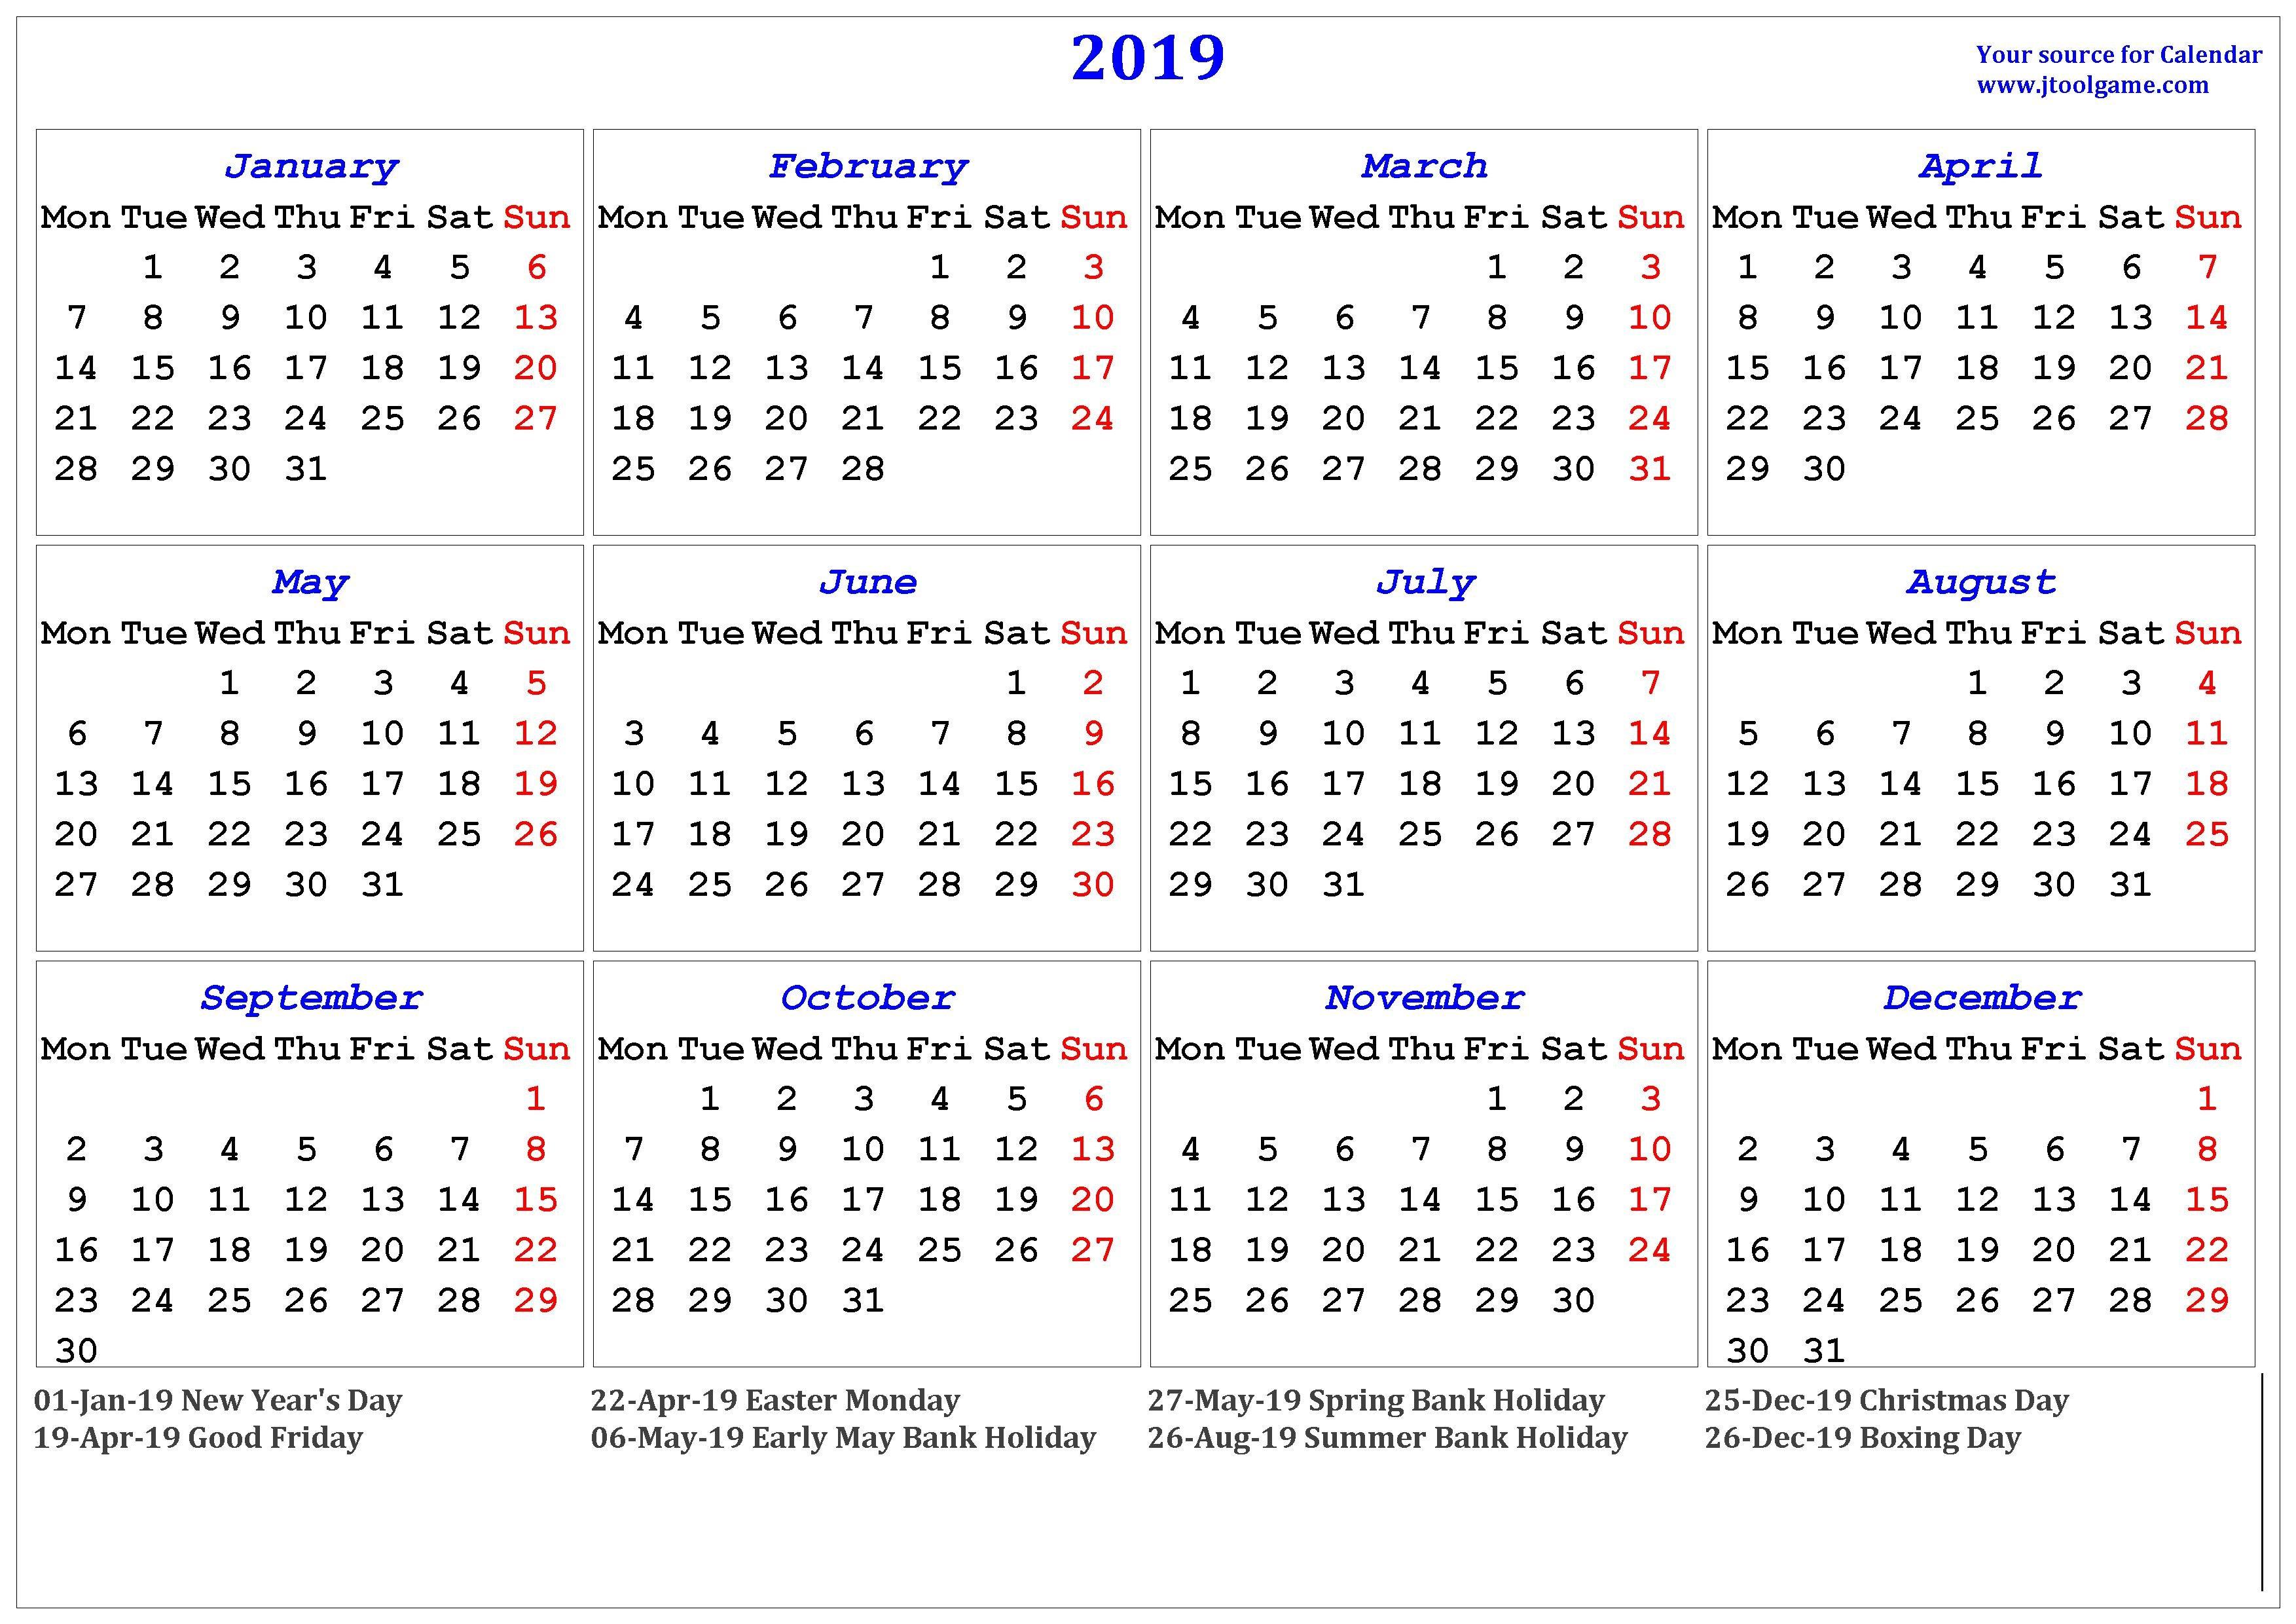 2019 Calendar – Printable Calendar. 2019 Calendar In Multiple Colors Calendar 2019 All Holidays